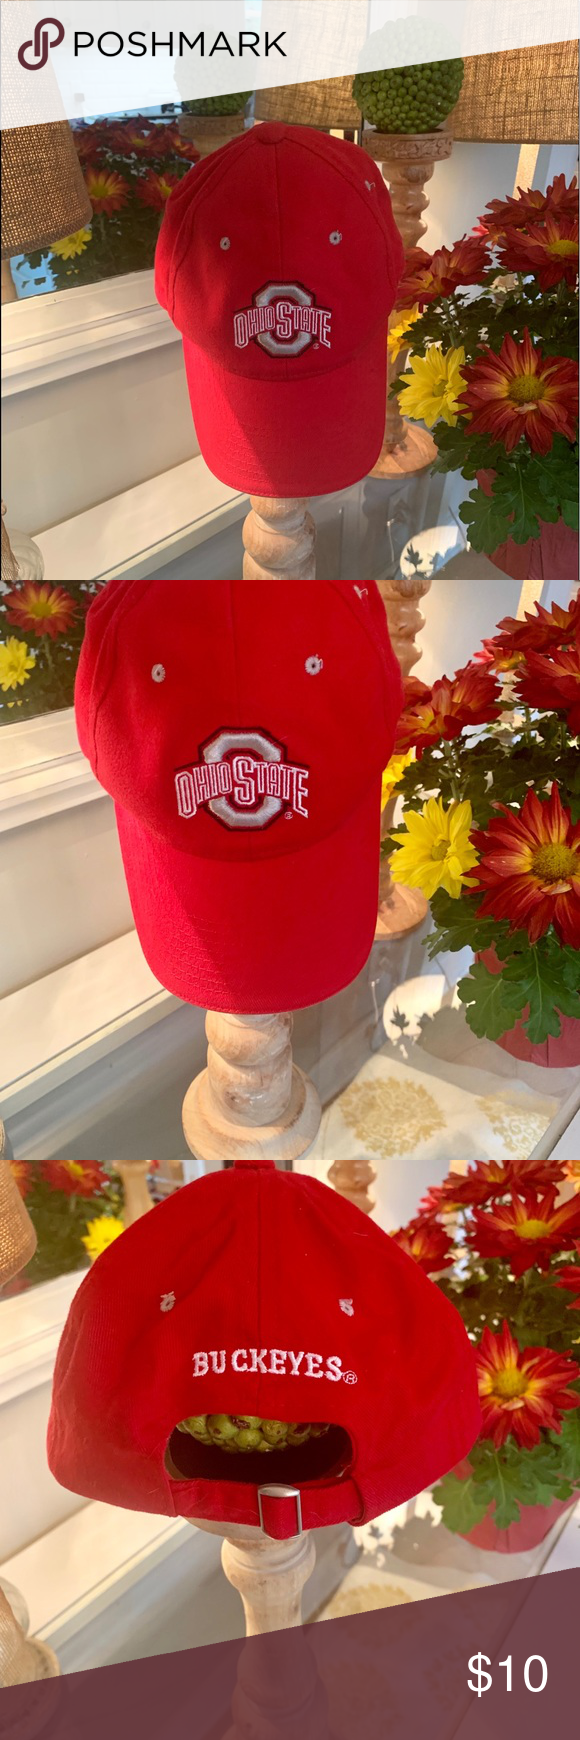 Ohio State Buckeyes red hat! ️�️ Ohio State Buckeyes red hat! ️�️ Accessories Hats